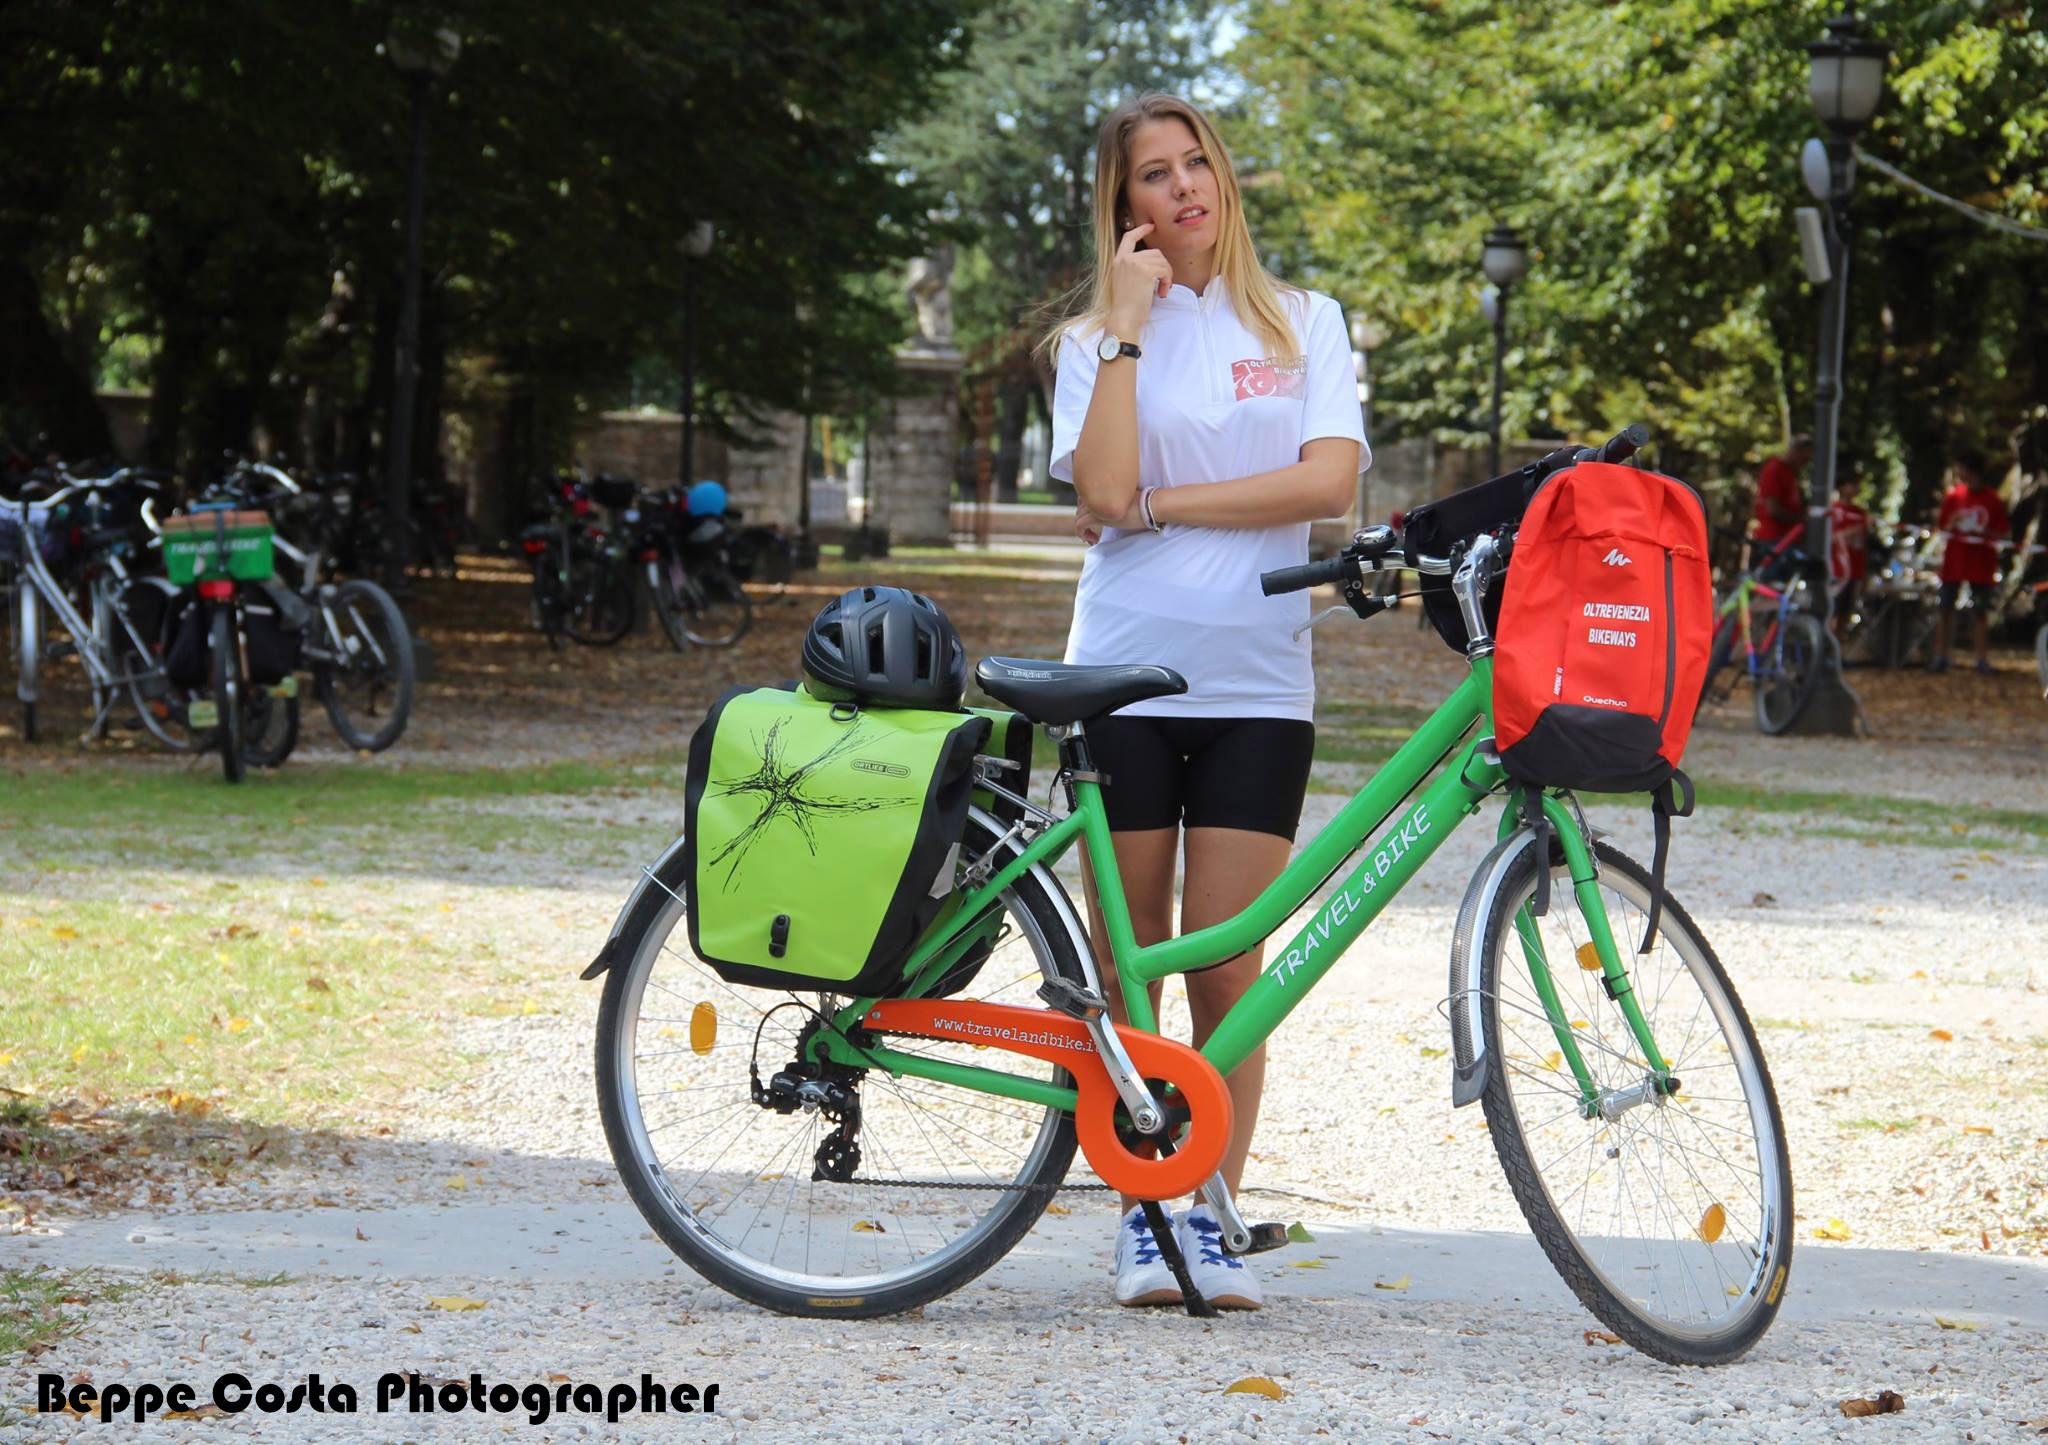 Miss Oltrevenezia Bikeways - Terry Coccato